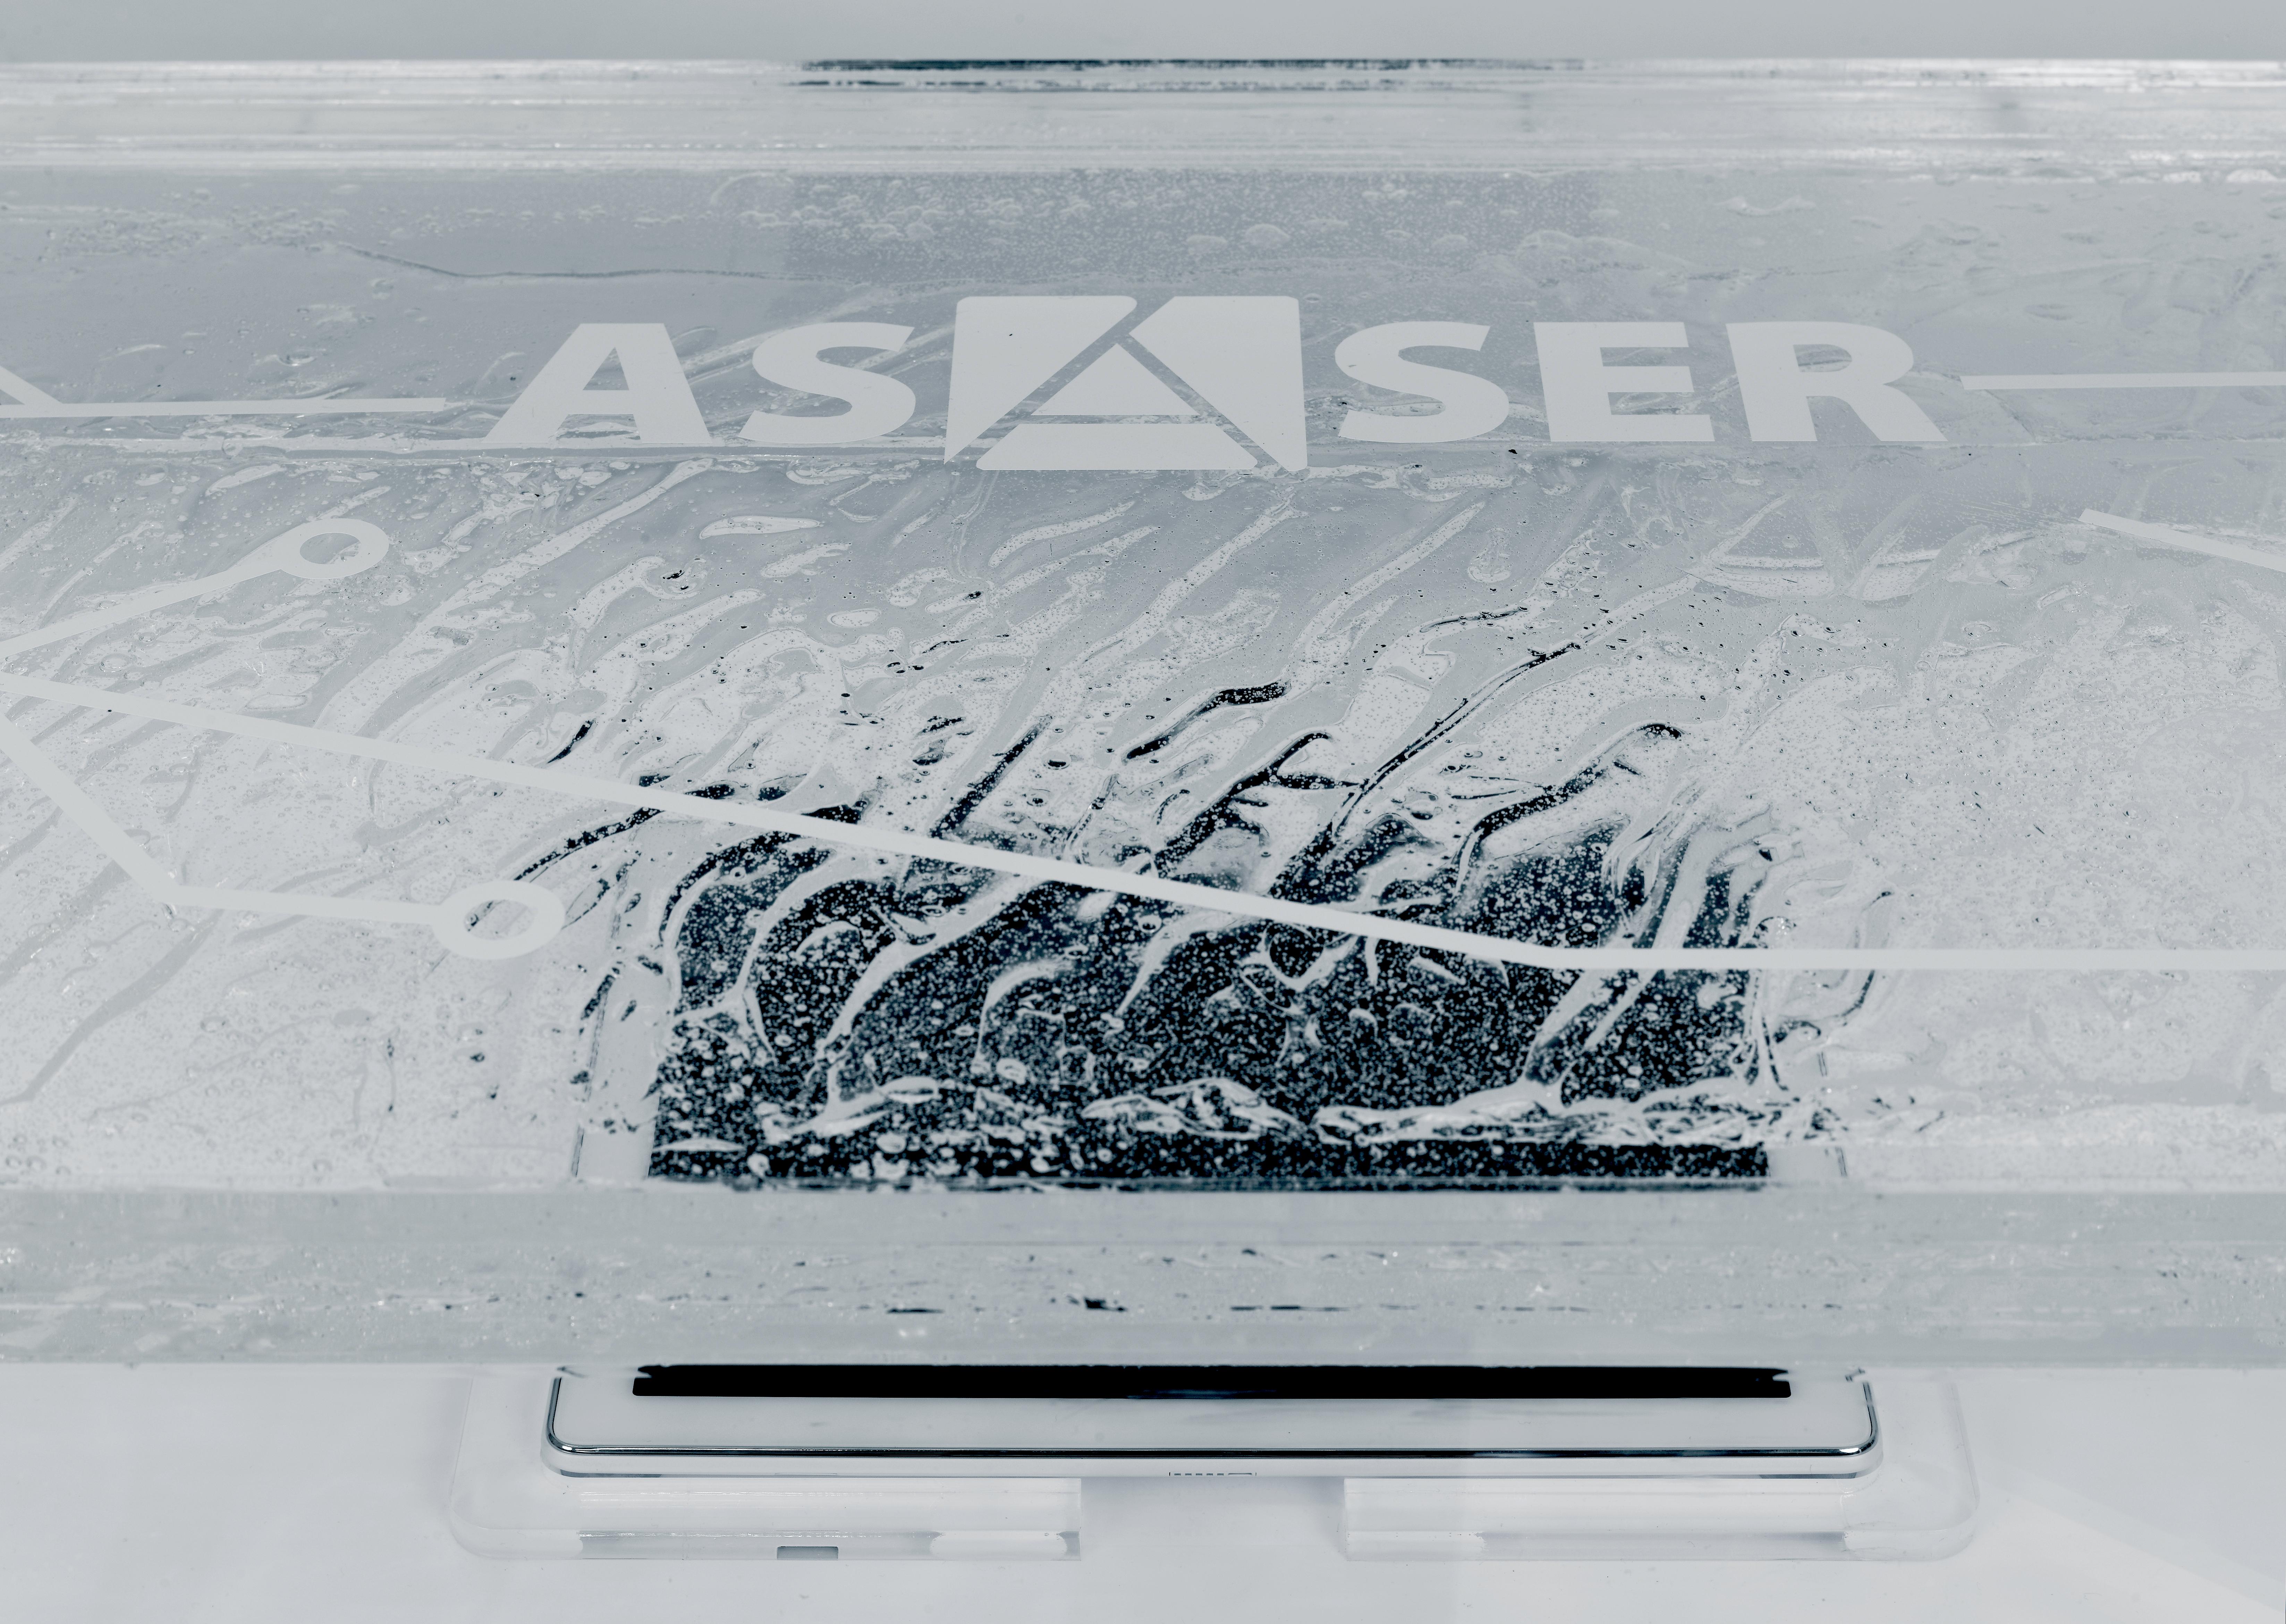 licitación red saneamiento bilbao, diseño gráfico Araba, Asaser